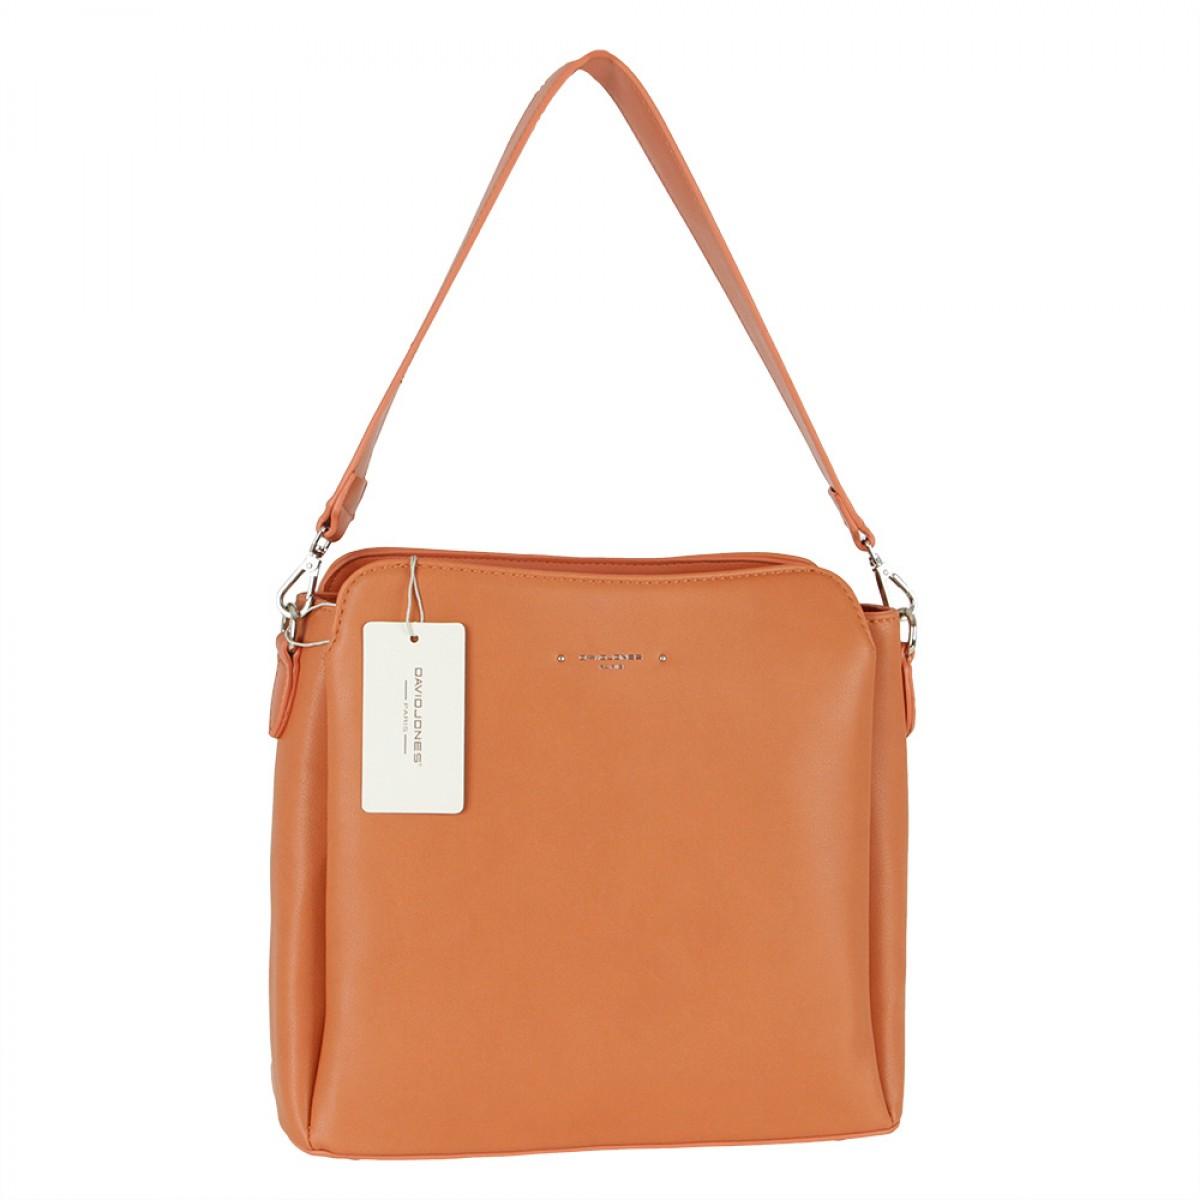 Жіноча сумка David Jones 6295-1 CORAL